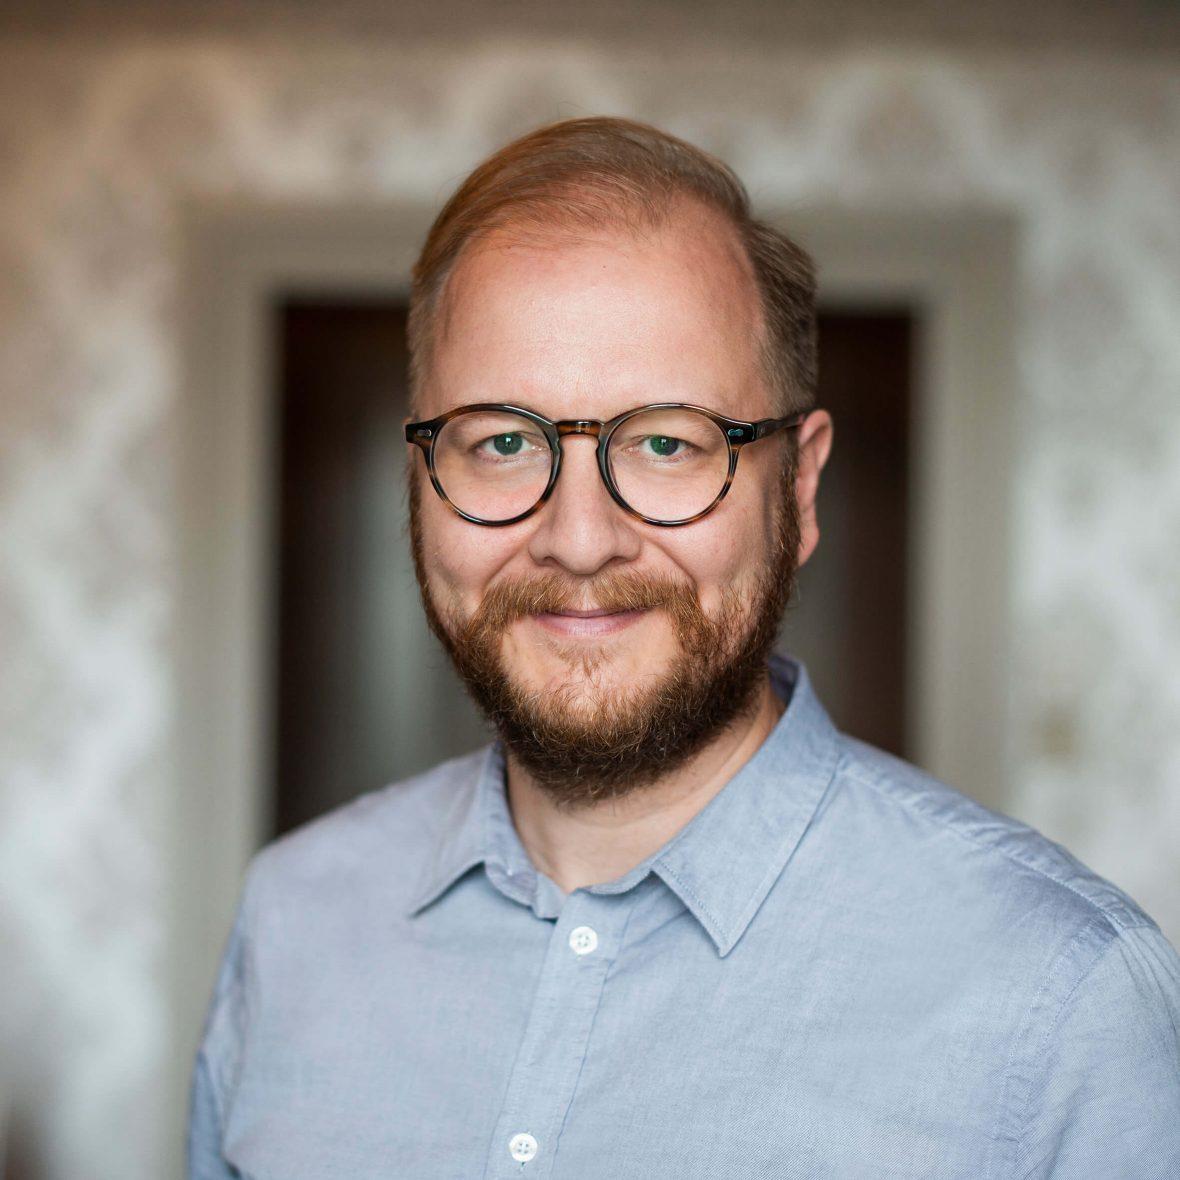 joel-bergqvist-aventyret